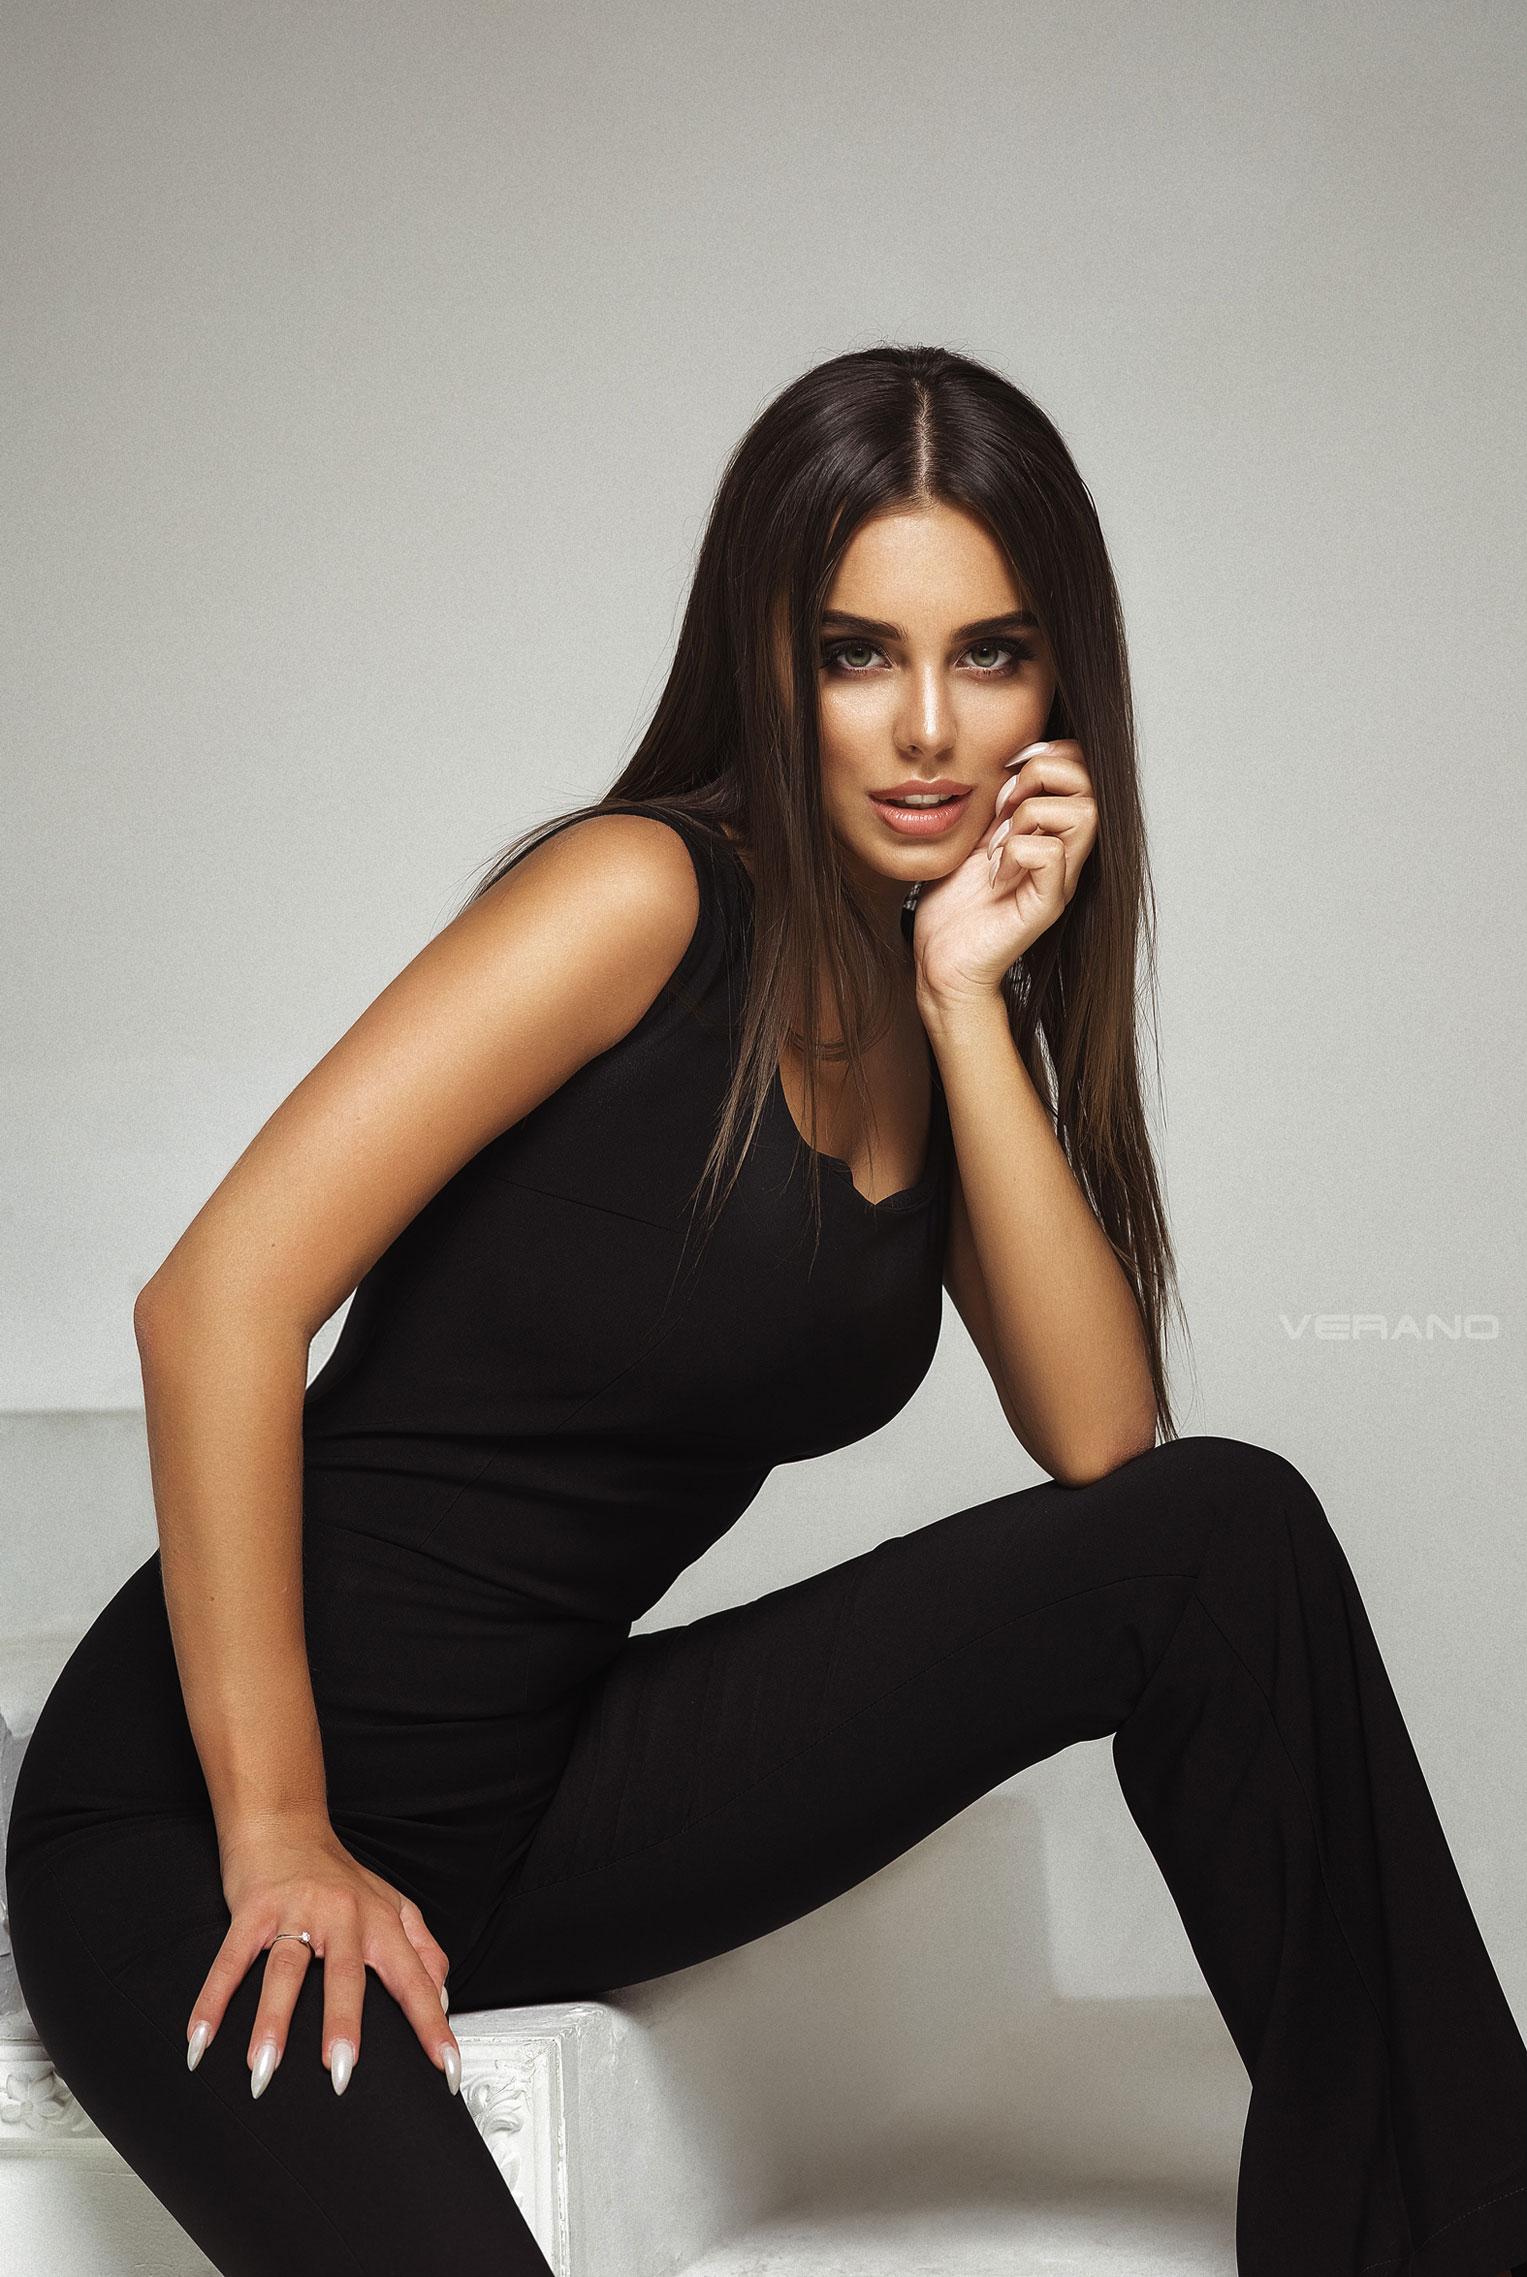 Анастасия Леонова / Anastasia Leonova by Nikolas Verano